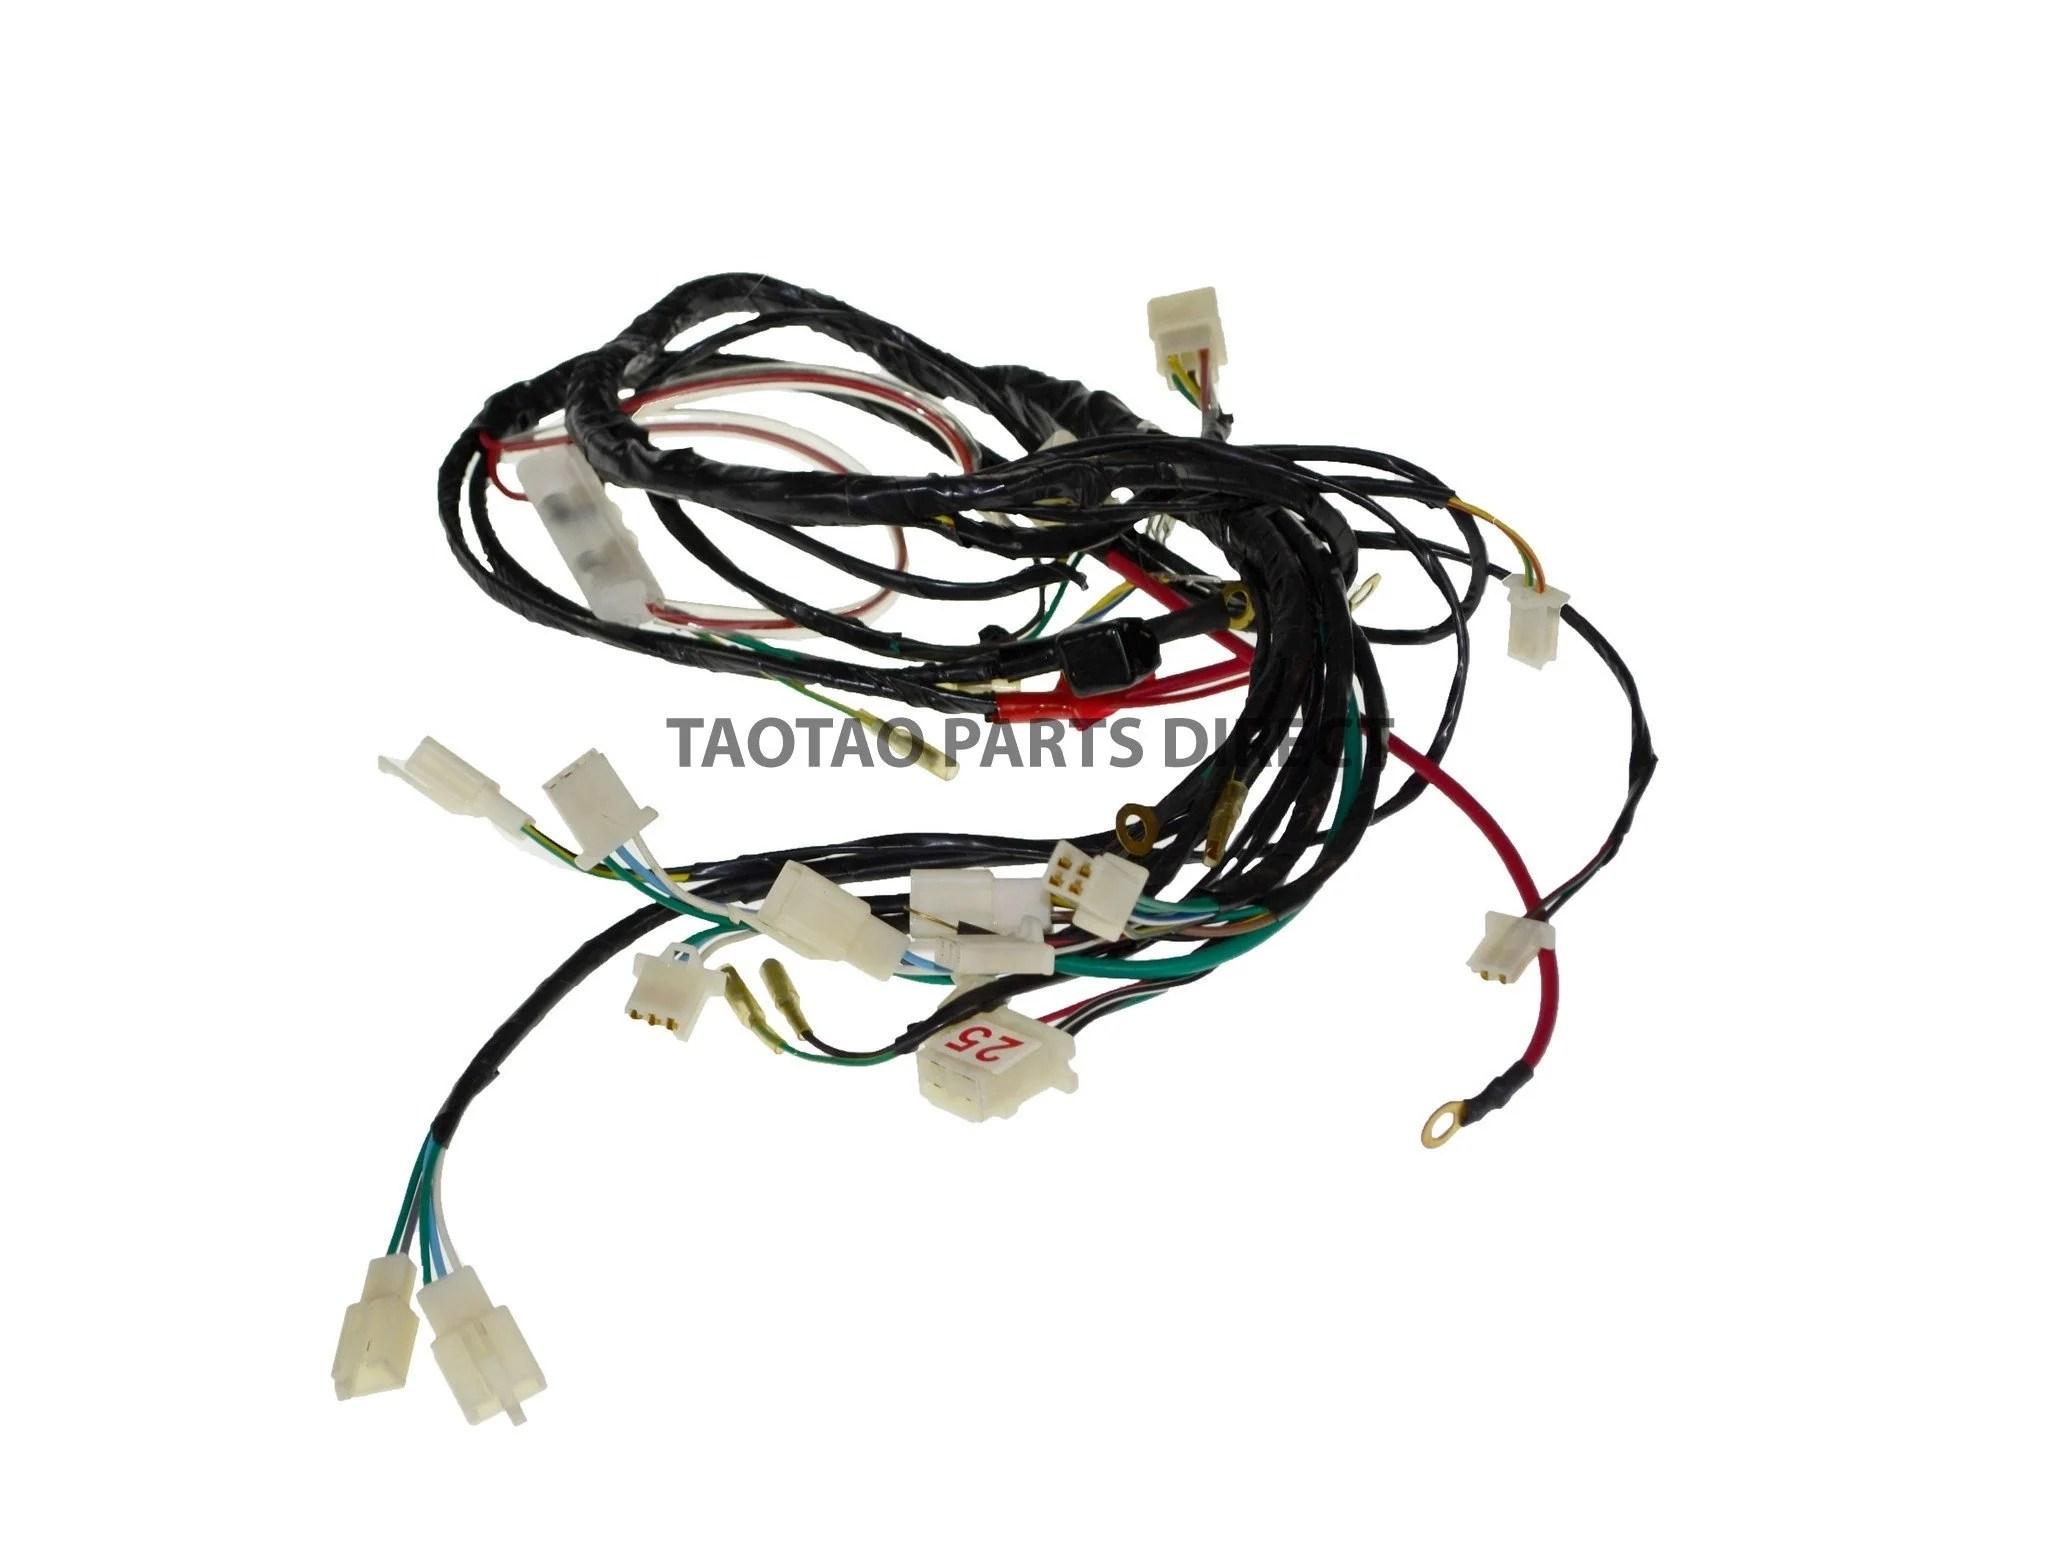 small resolution of ata250d wire harness 25 taotao parts directatv parts ata250d wire harness 25